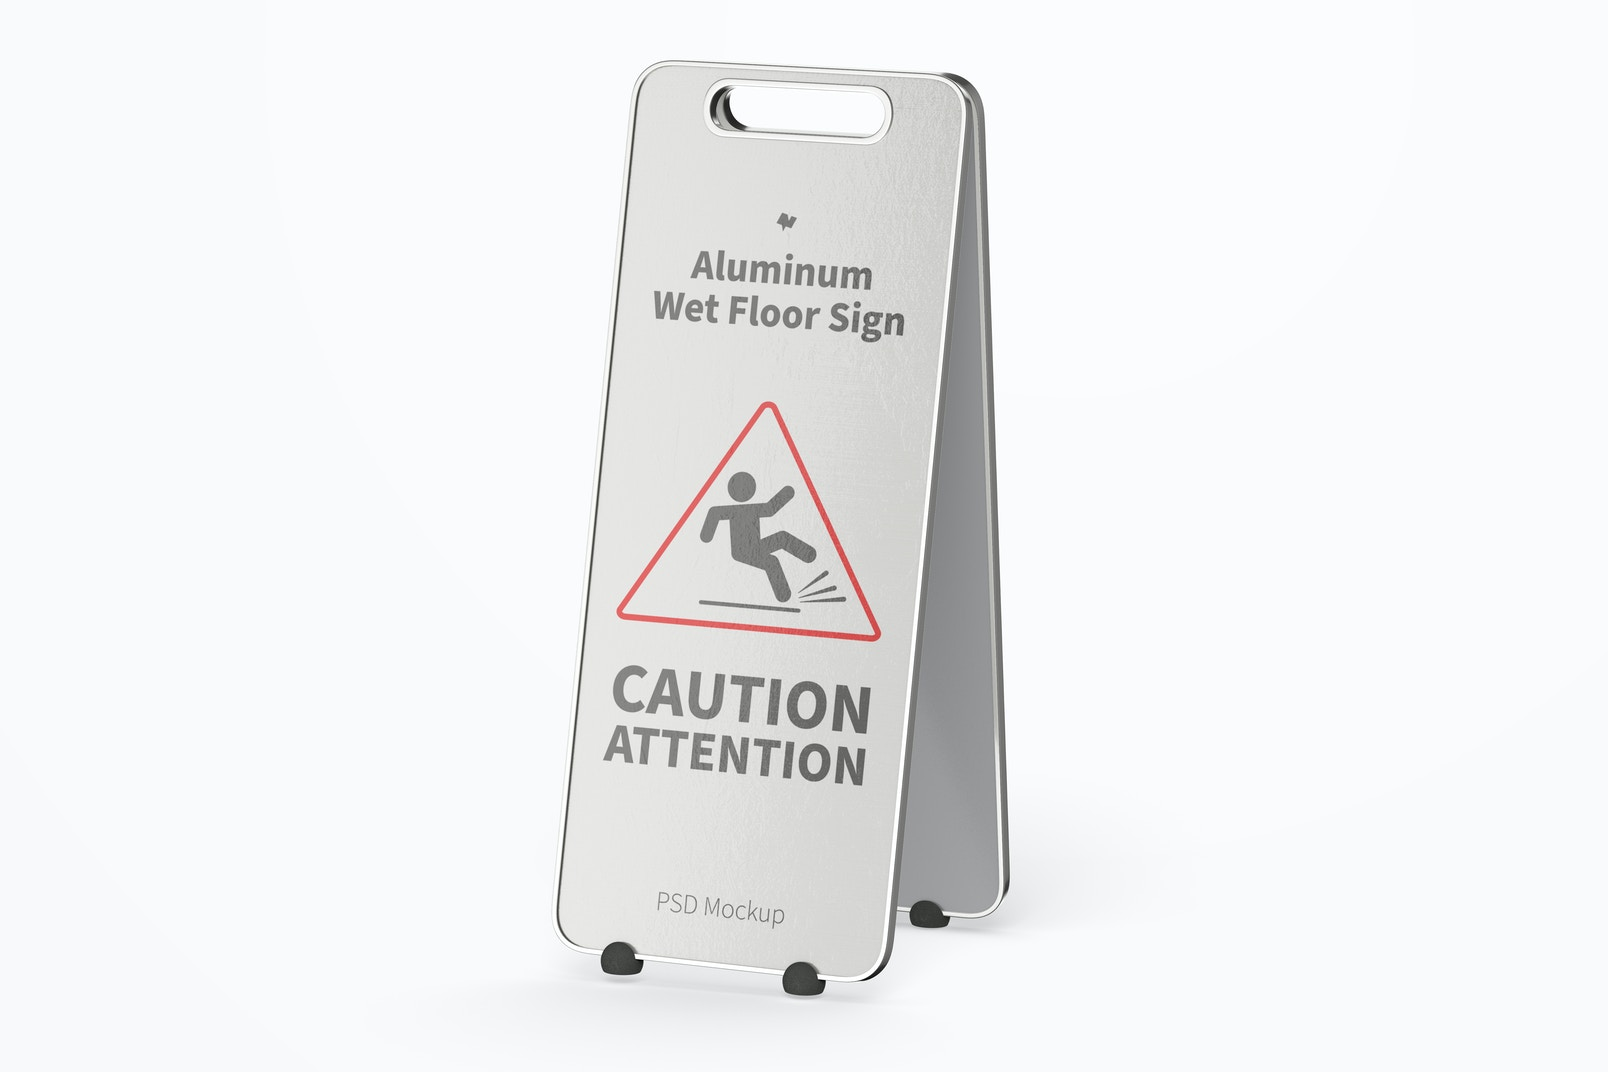 Aluminum Wet Floor Sign Mockup, Right View